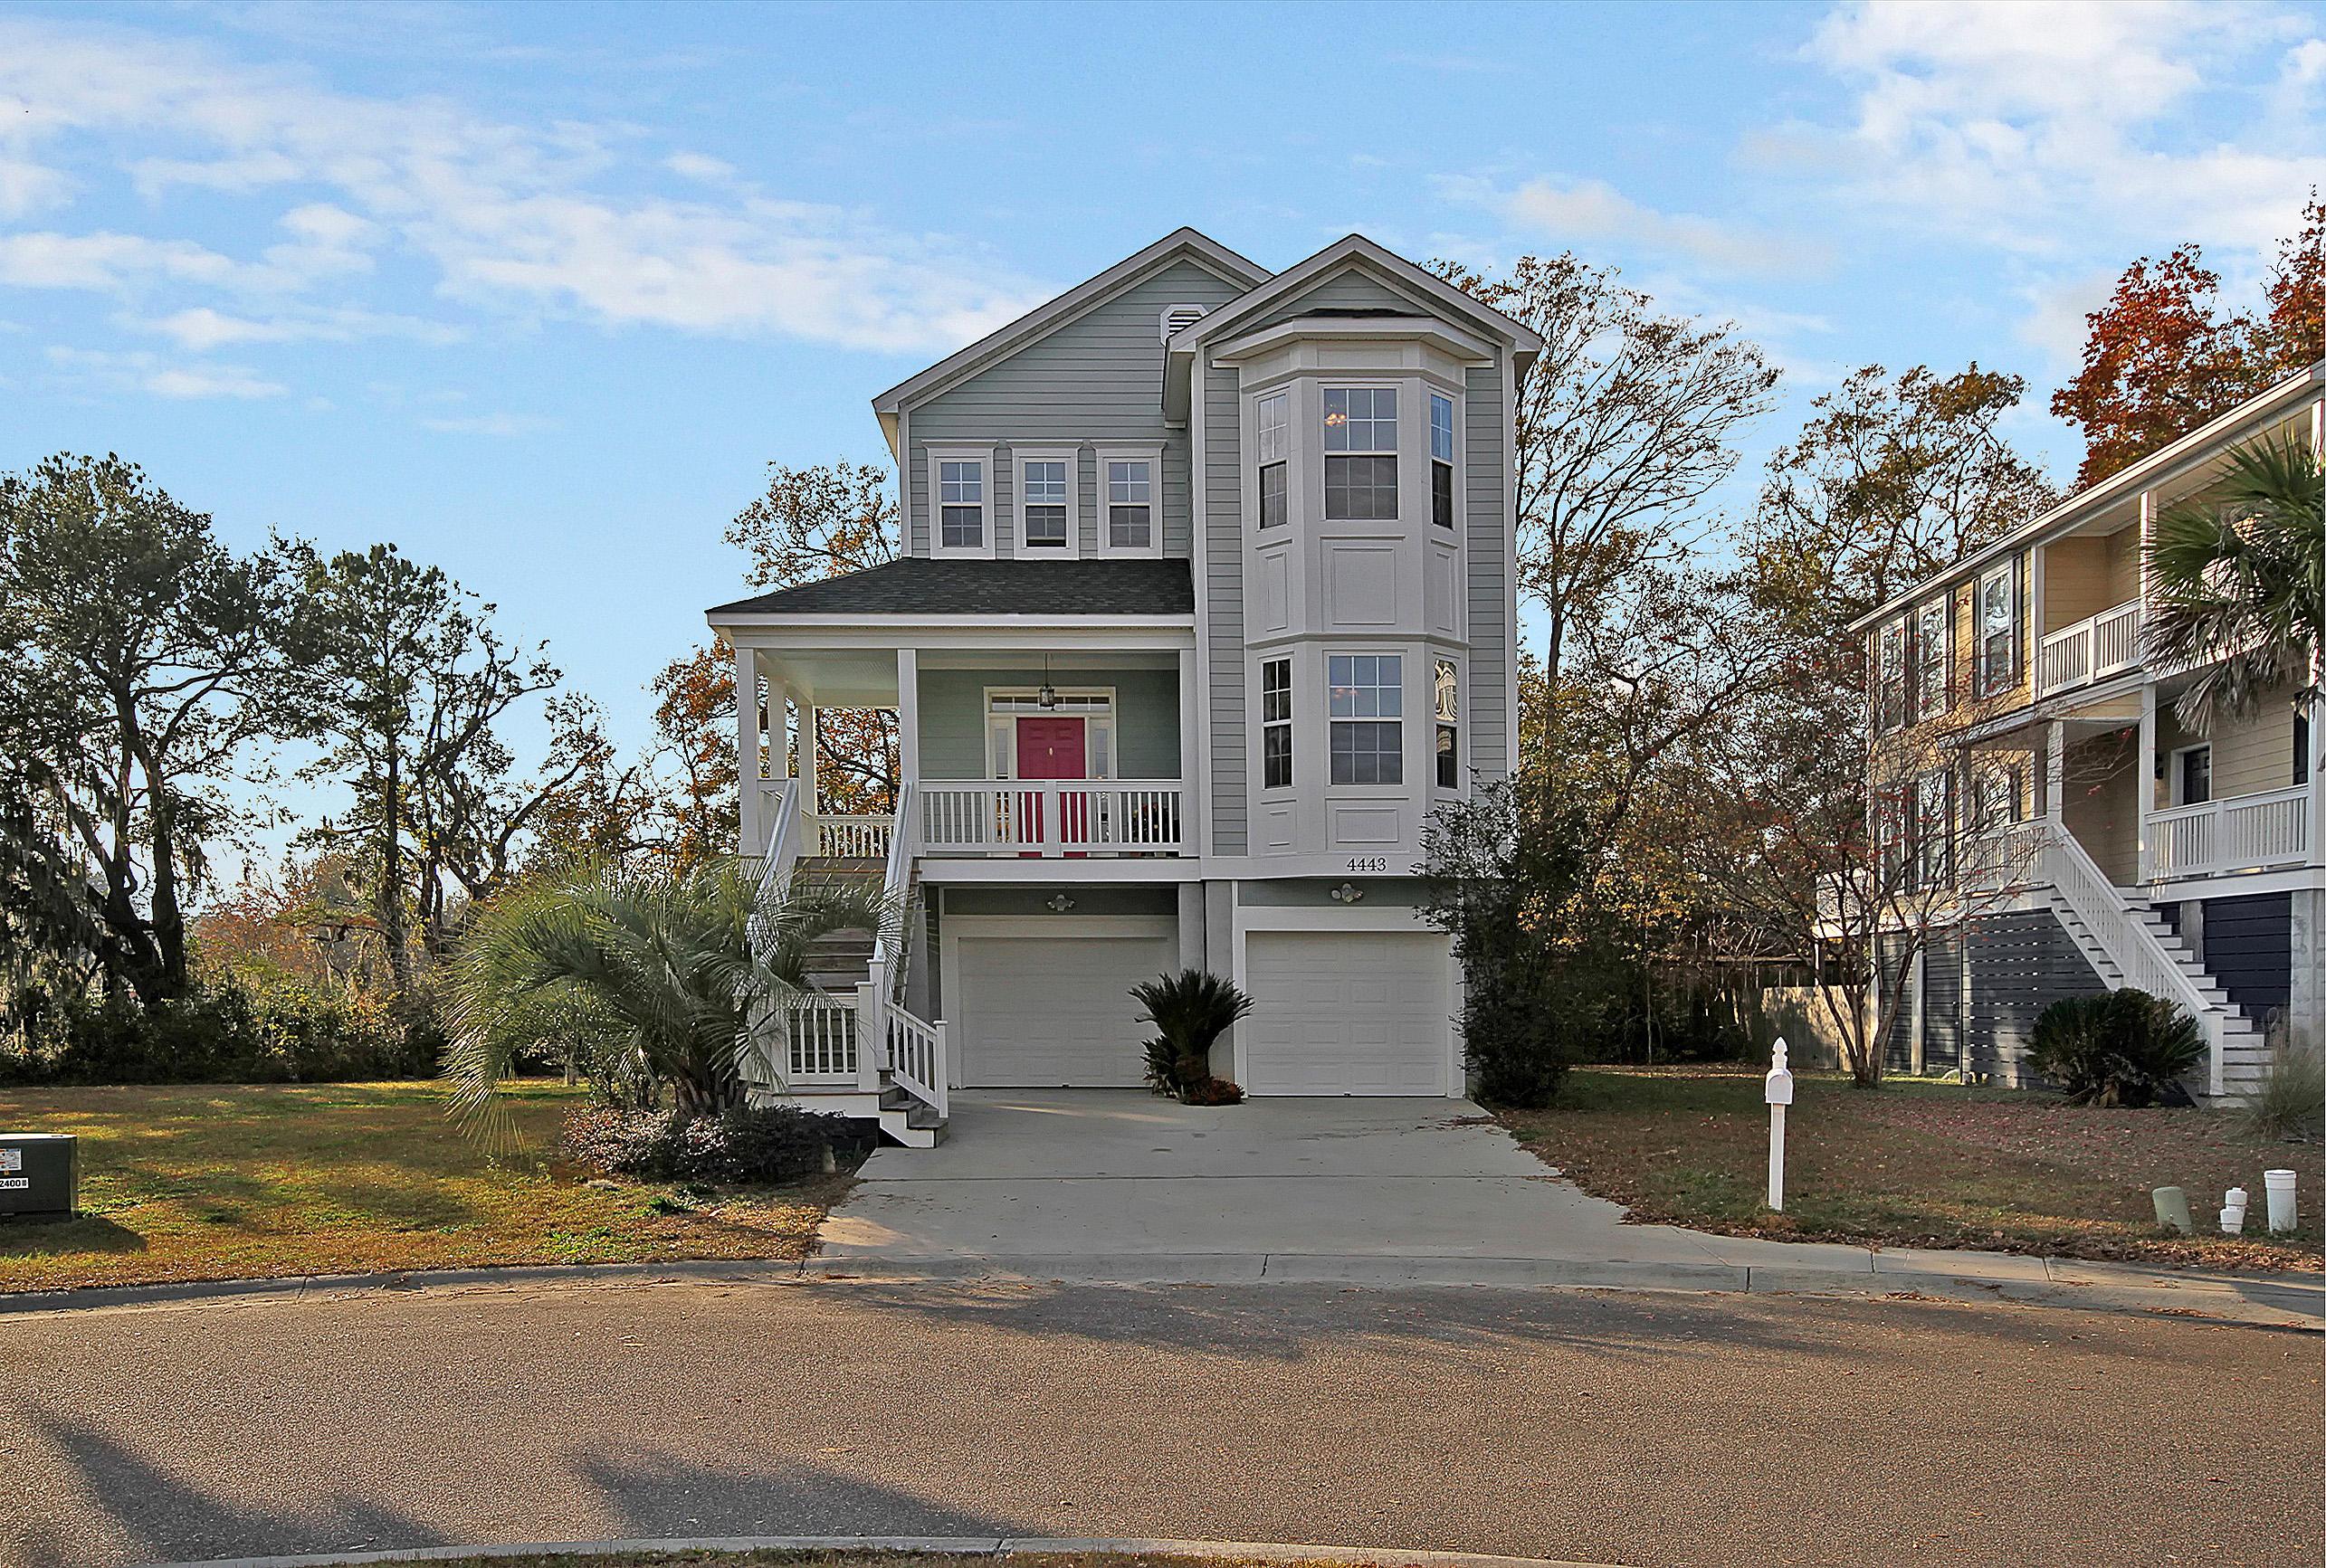 Photo of 4443 Hope's Circle, North Charleston, SC 29405